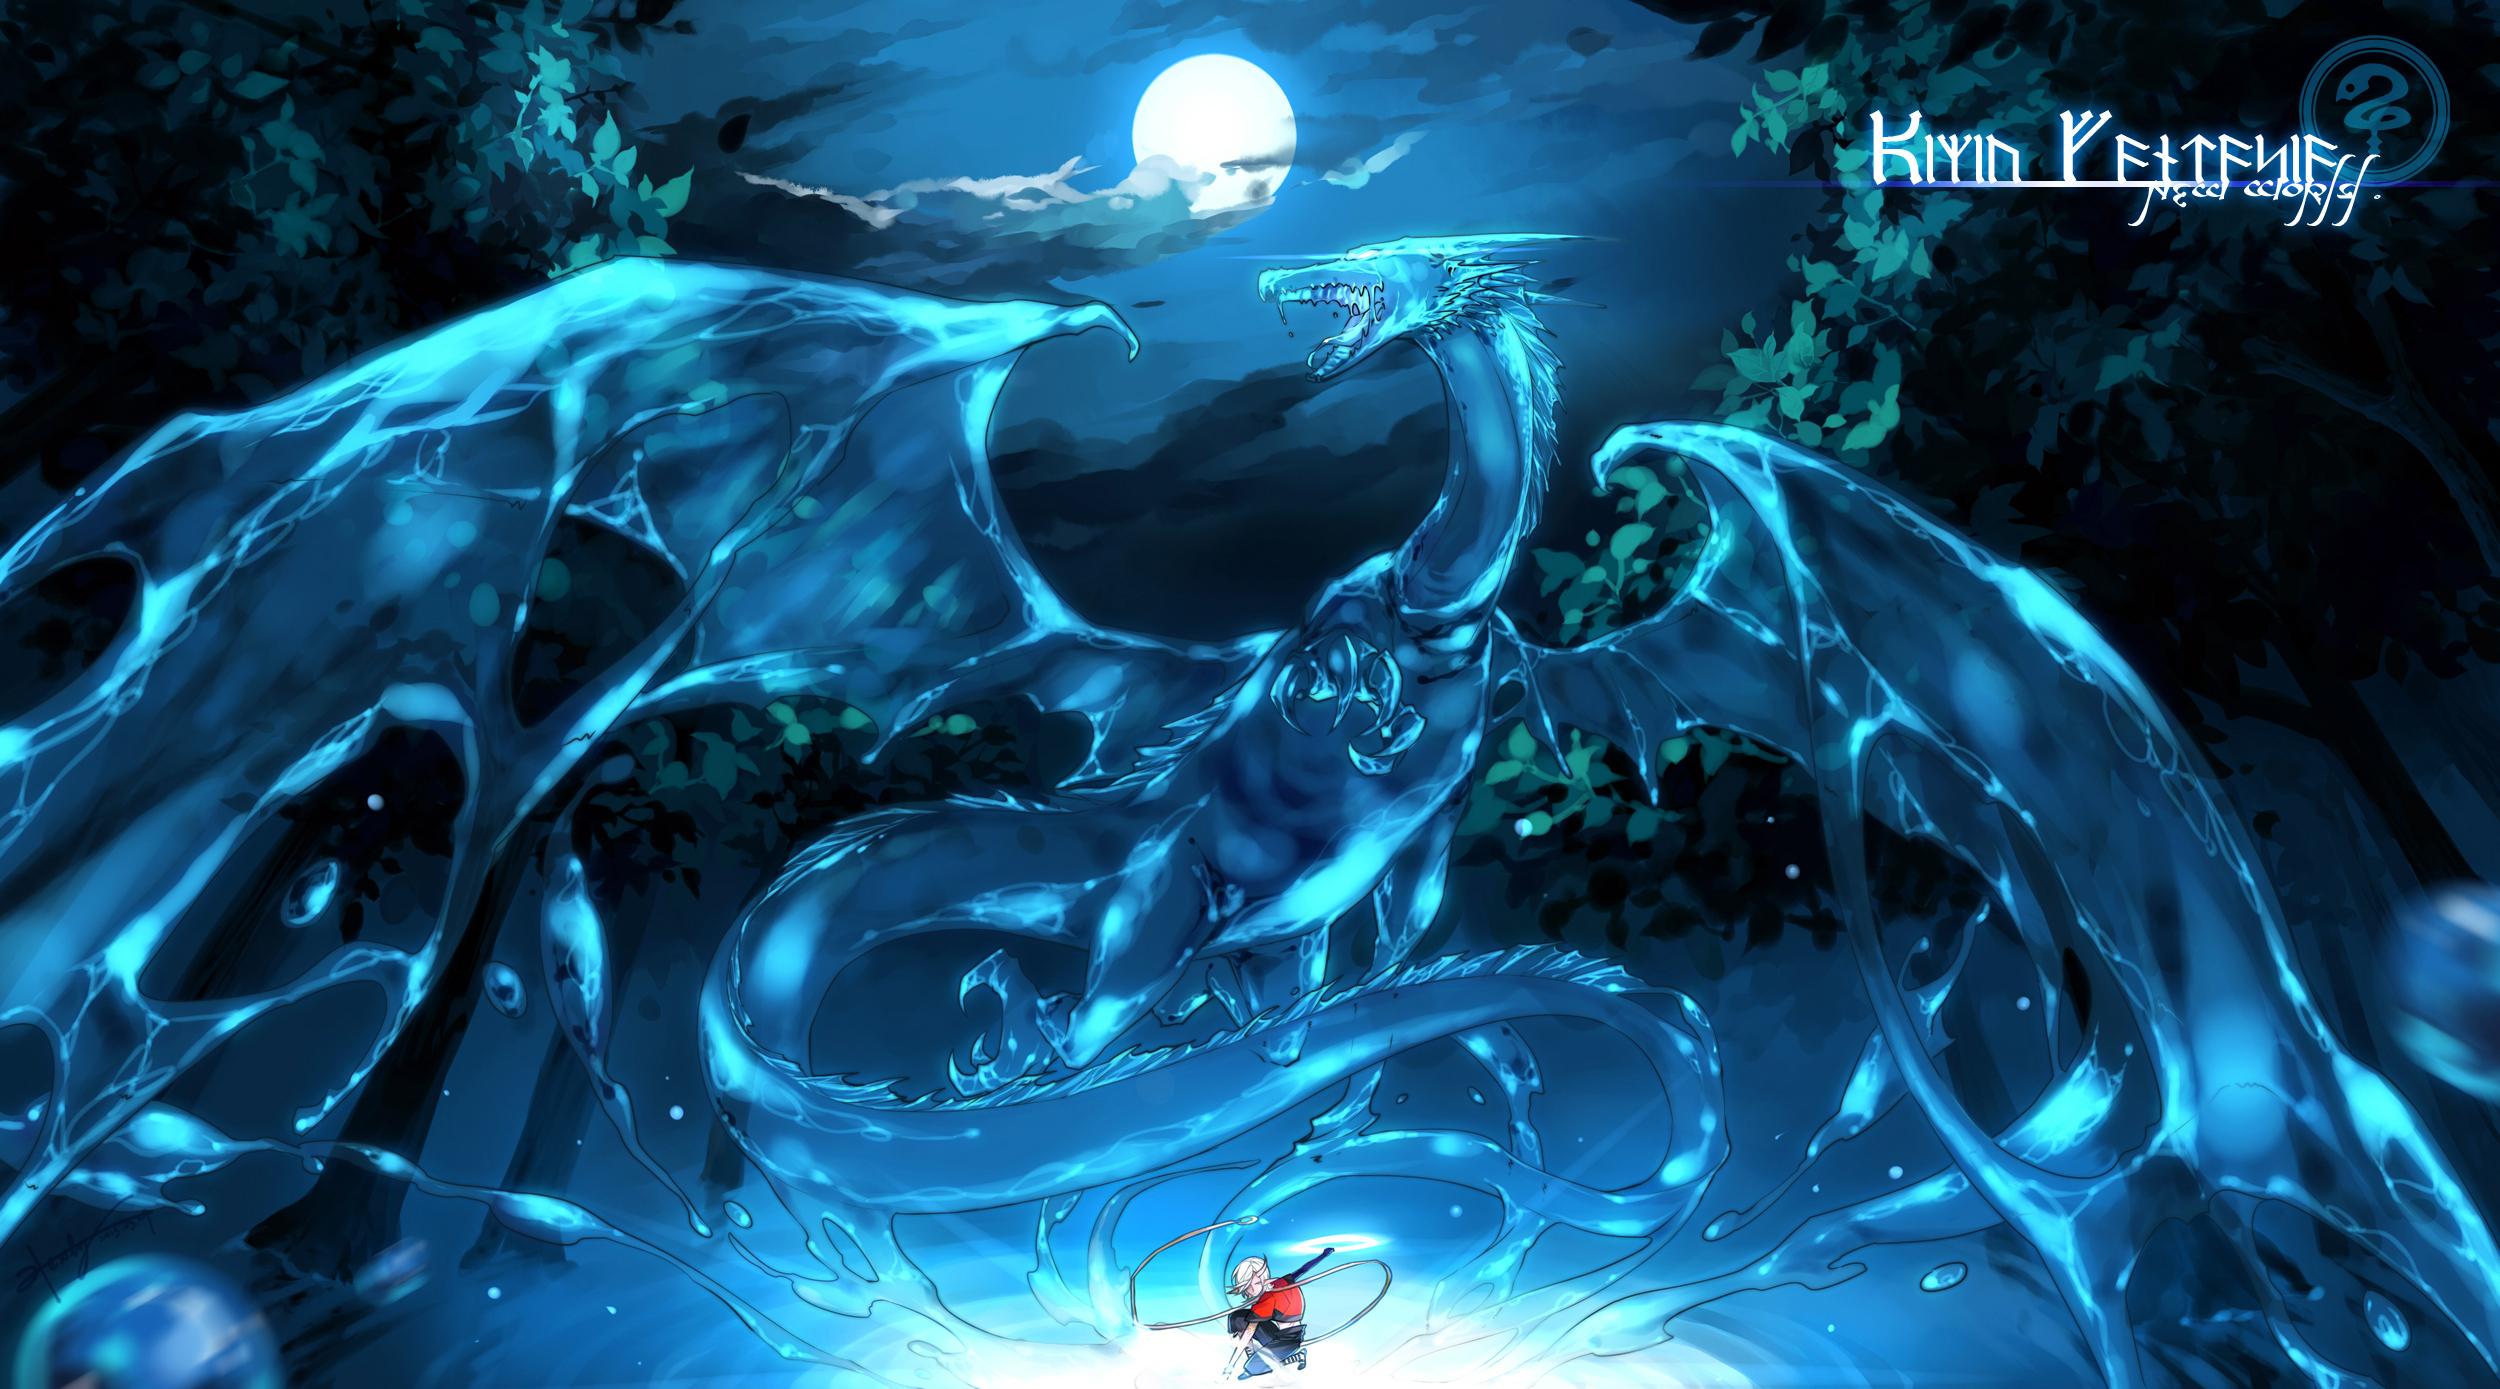 free download blue eyes white dragon wallpapers | pixelstalk